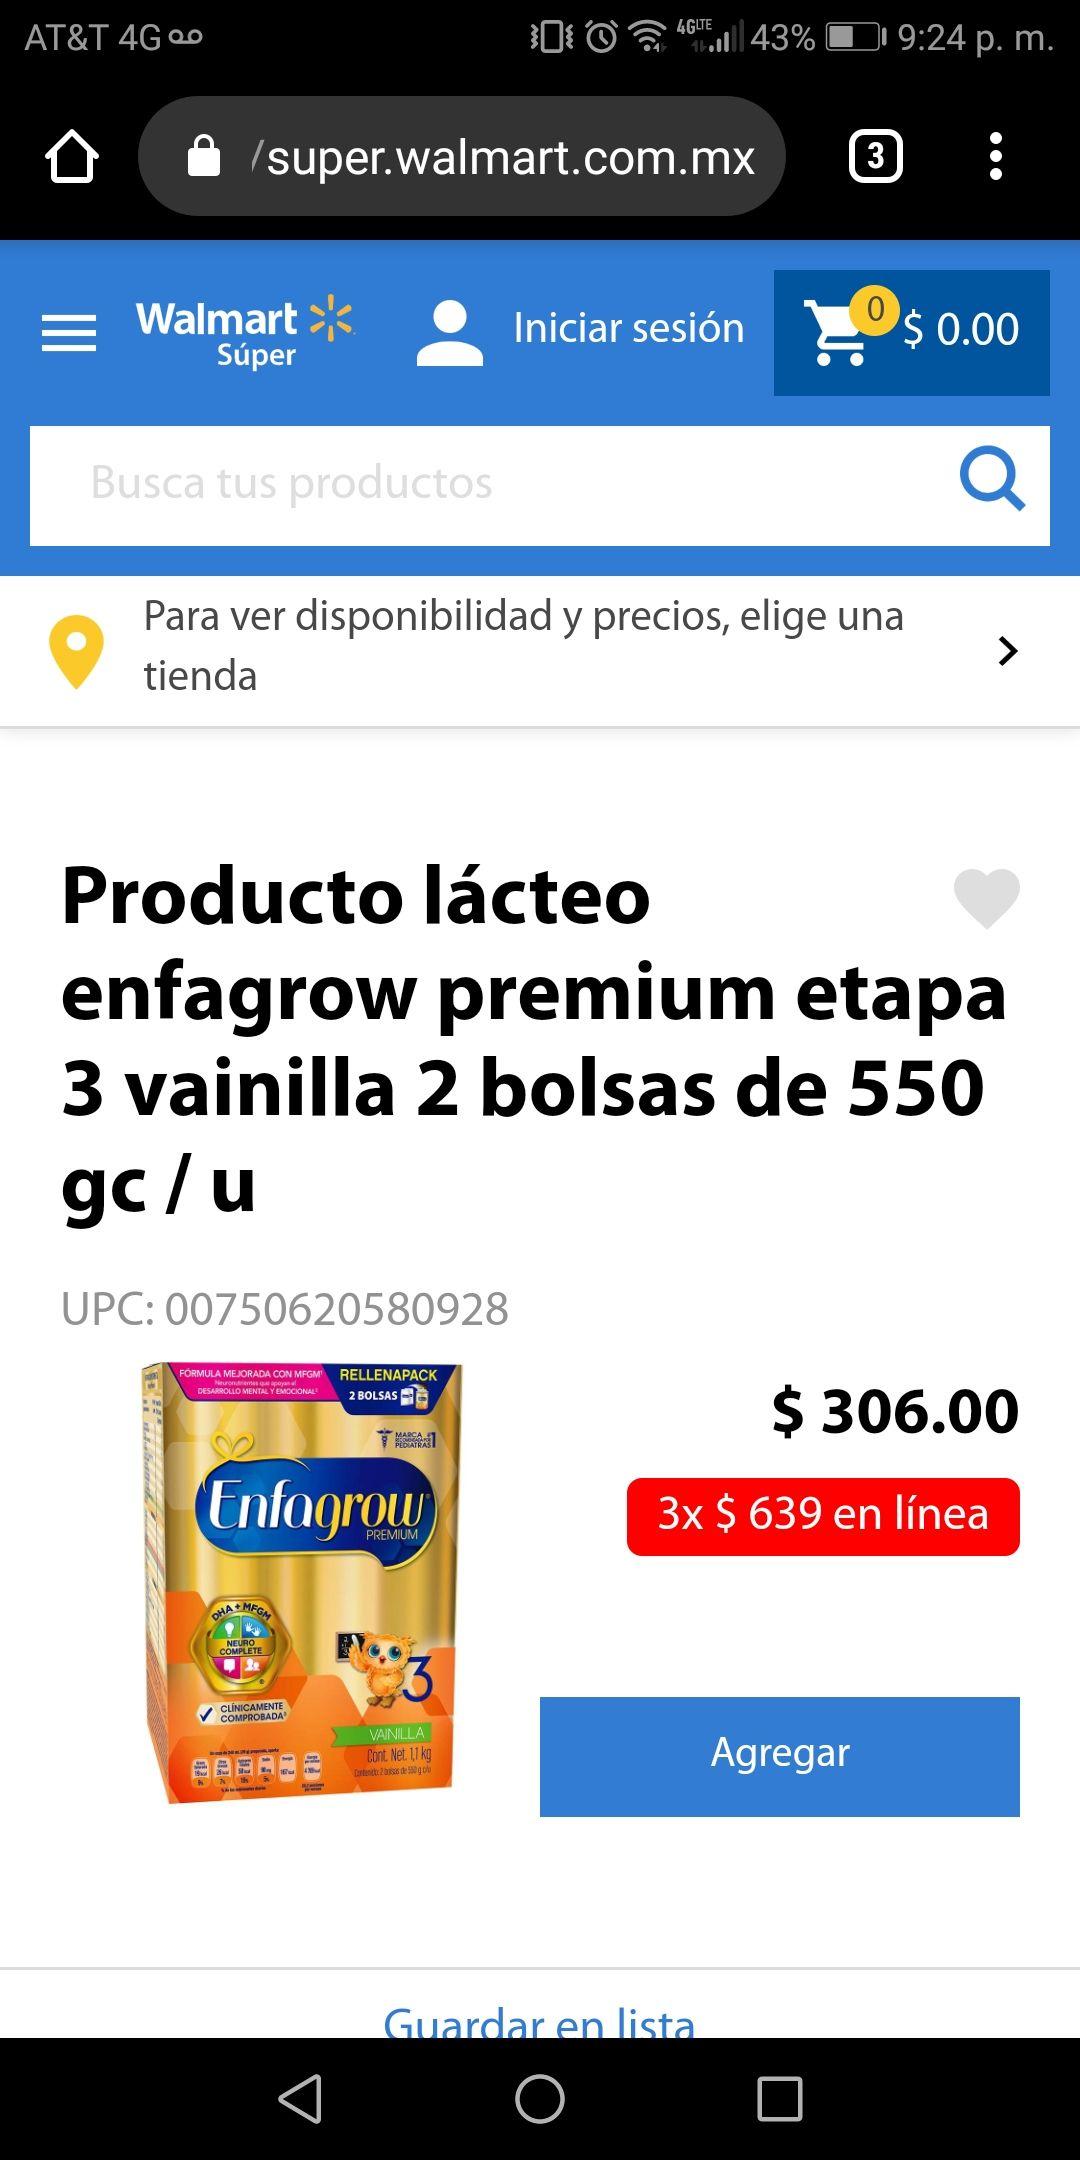 Walmart: Producto lácteo enfagrow premium etapa 3 vainilla 2 bolsas de 550 g c/u (3x$639)